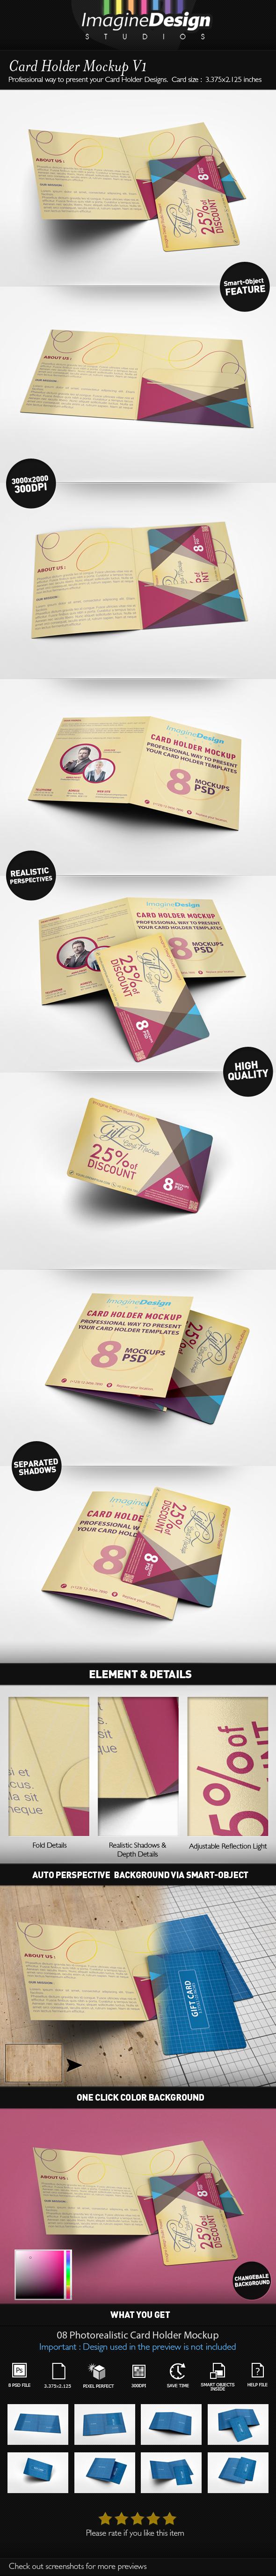 Card Holder Mockup V1 by idesignstudio